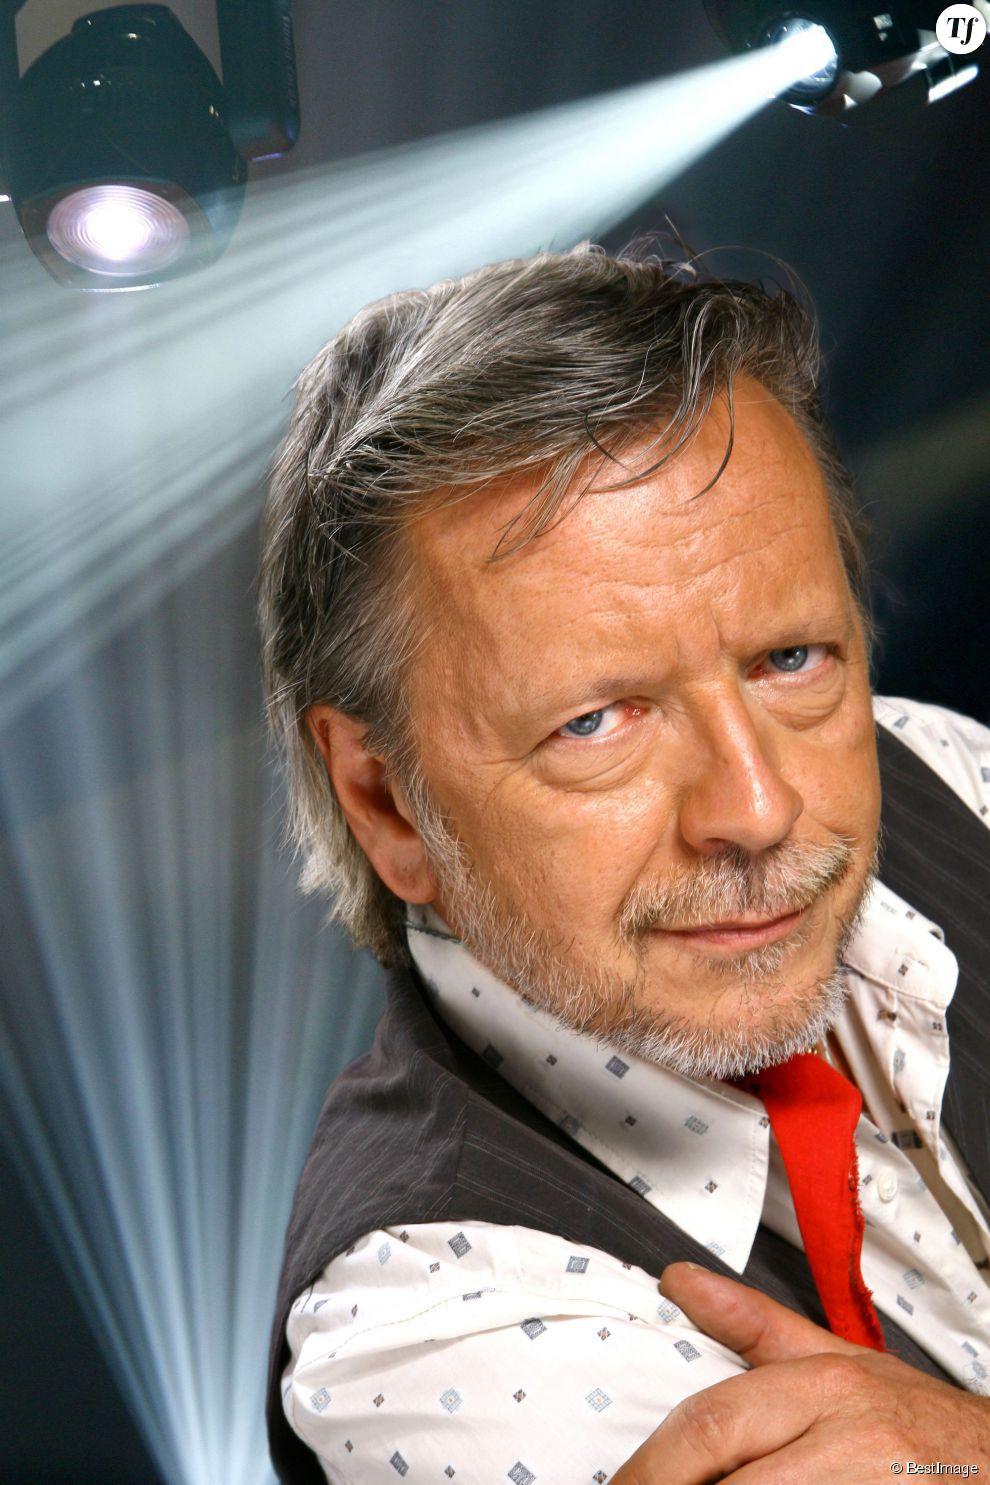 Renaud a composé 14 chansons, dont une sera un duo avec Grand Corps Malade.